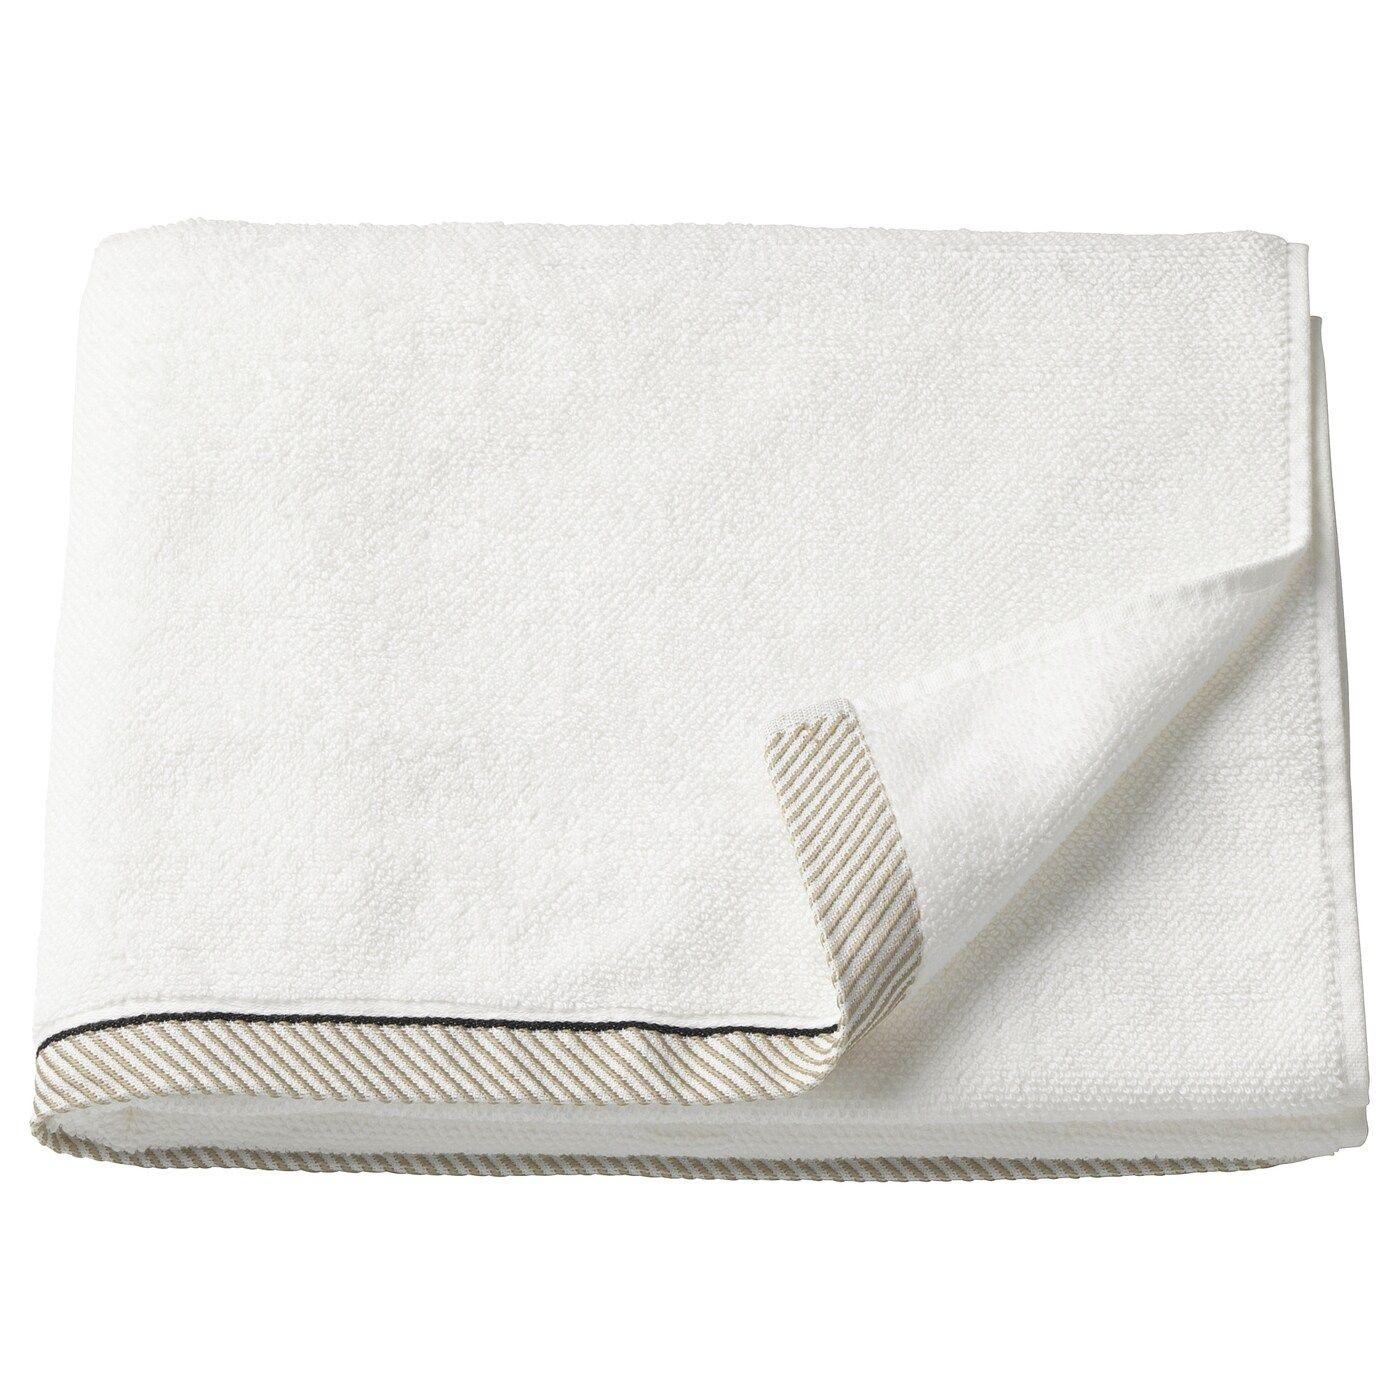 Vikfjard Drap De Bain Blanc 70x140 Cm In 2020 Handdoeken Ikea En Wasverzachter